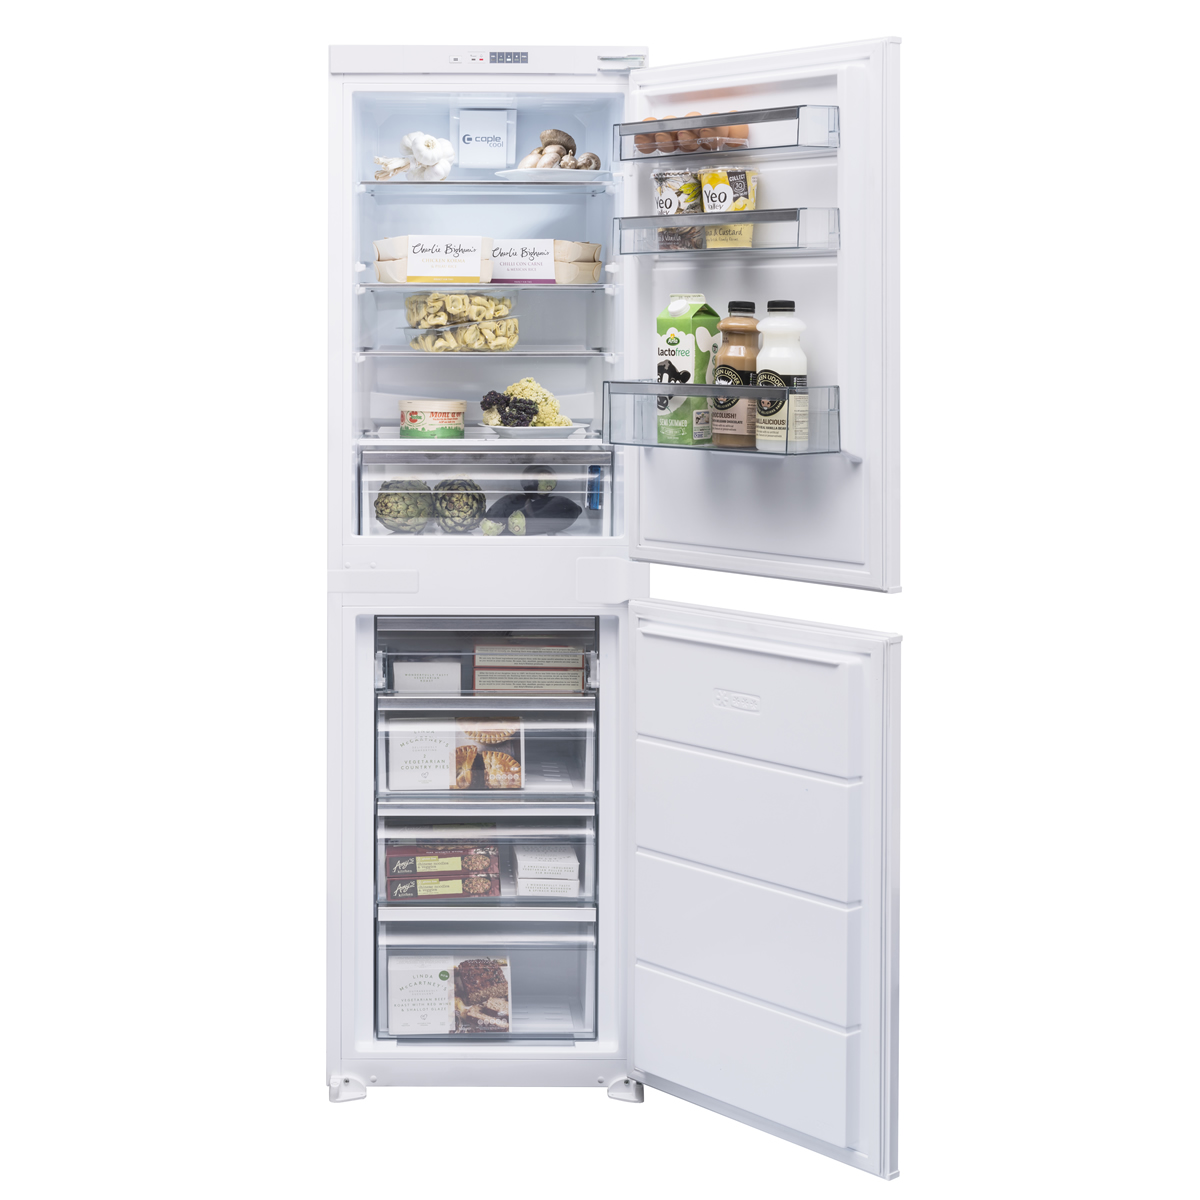 R5505 234litre Integrated Fridge Freezer Frost Free Class A++